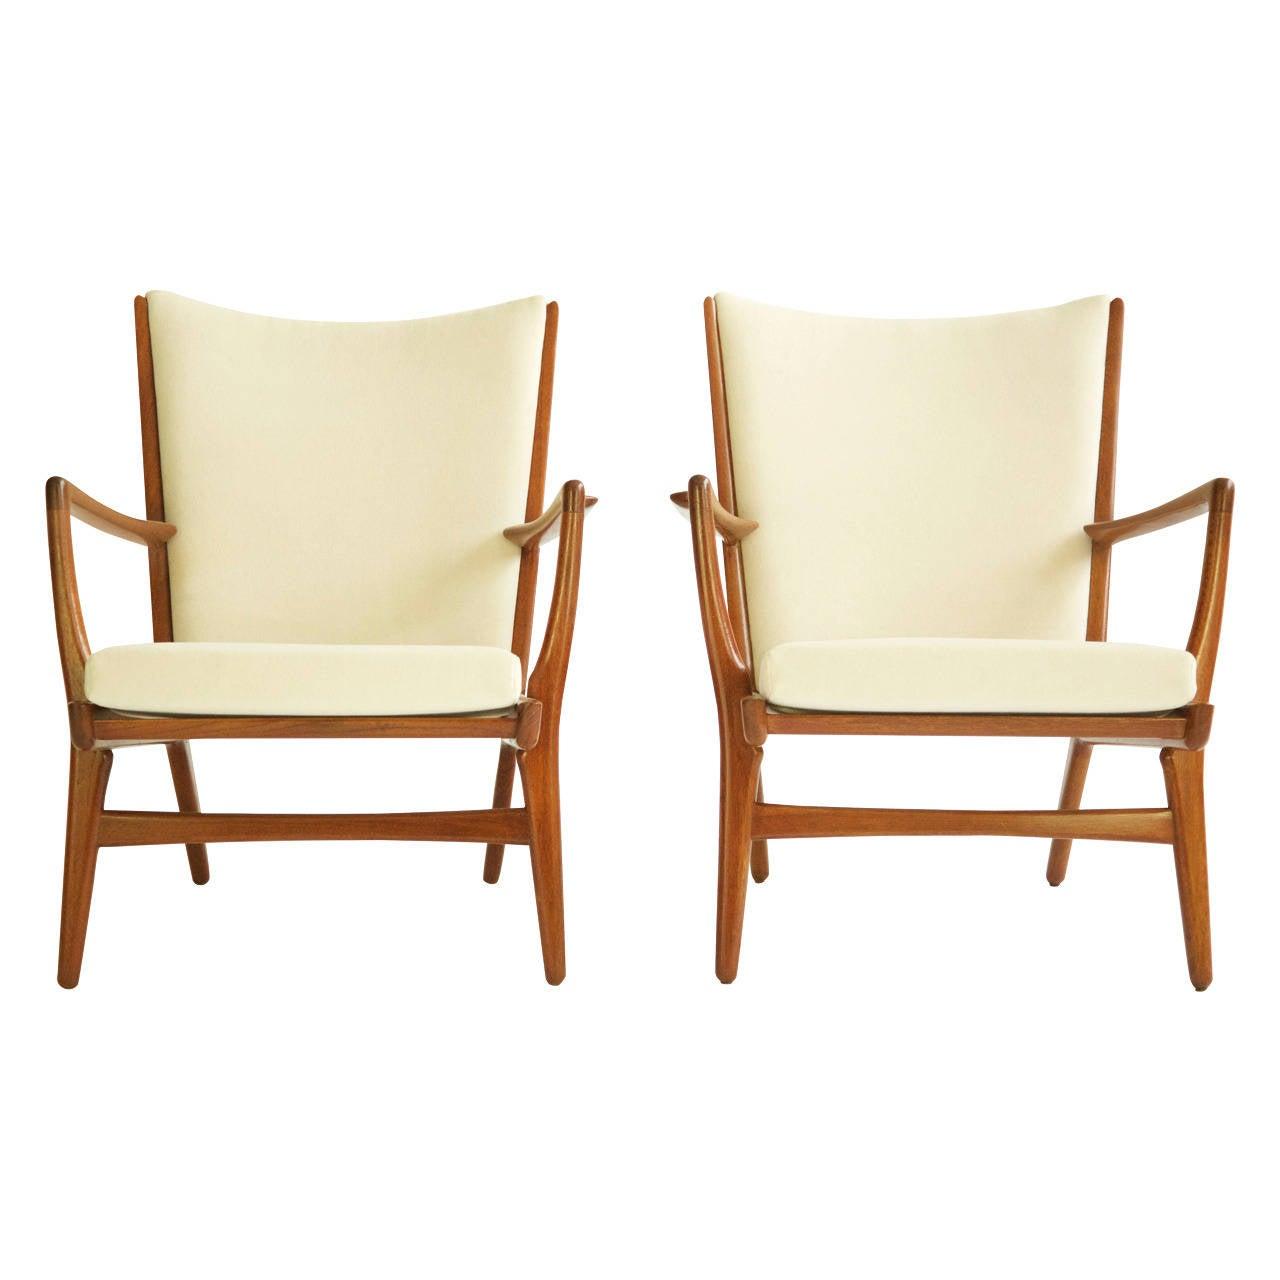 Hans Wegner Pair of Lounge Chairs